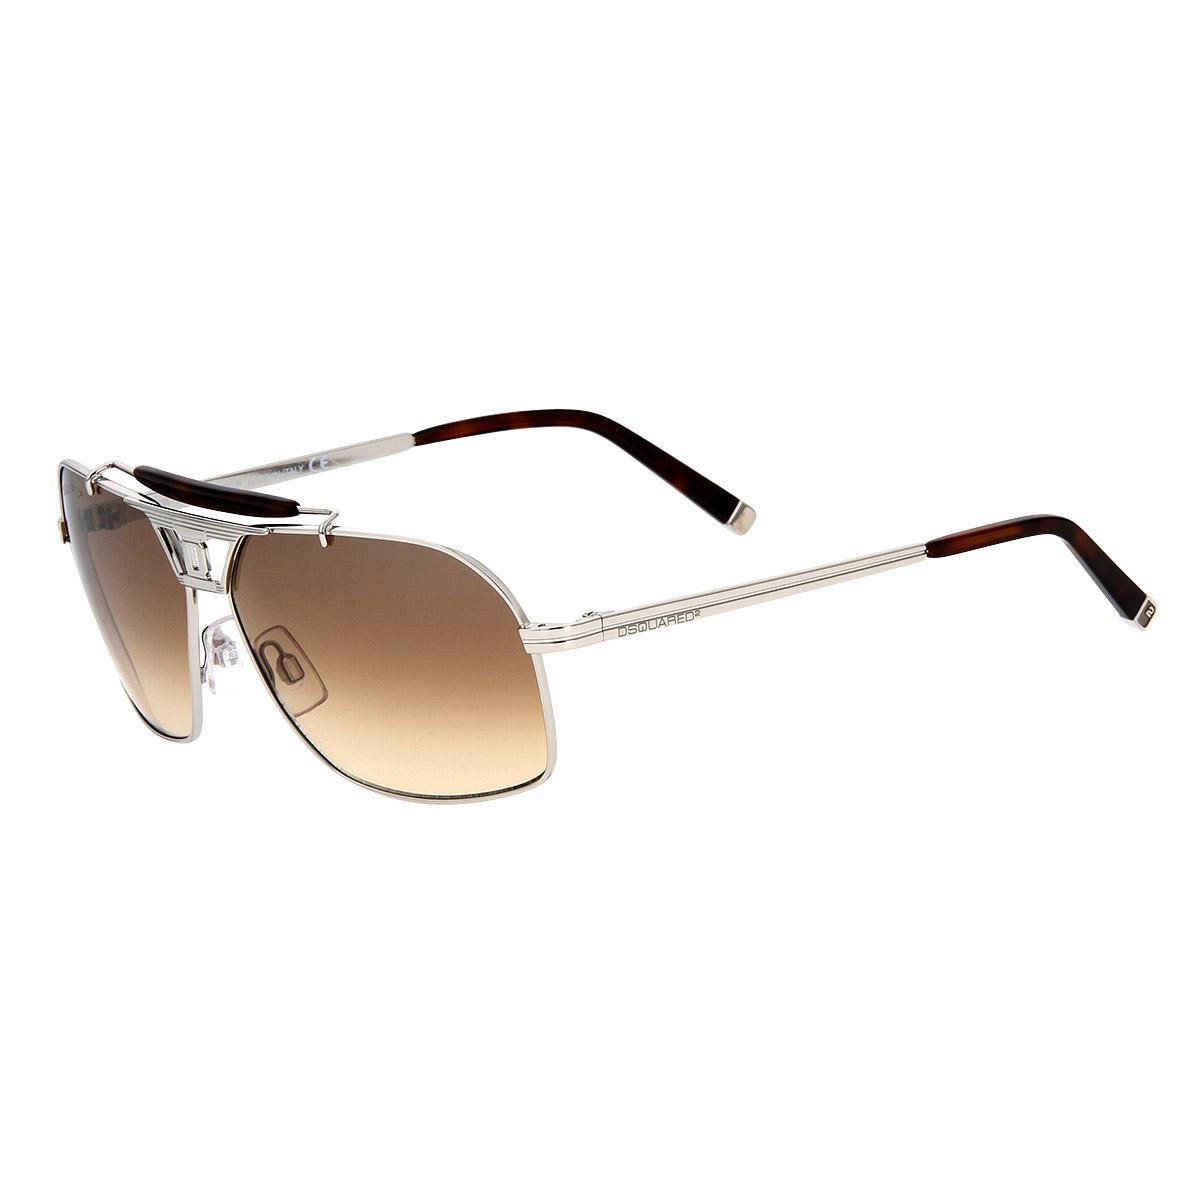 cfe83202304 D g Aviator Sunglasses Ebay